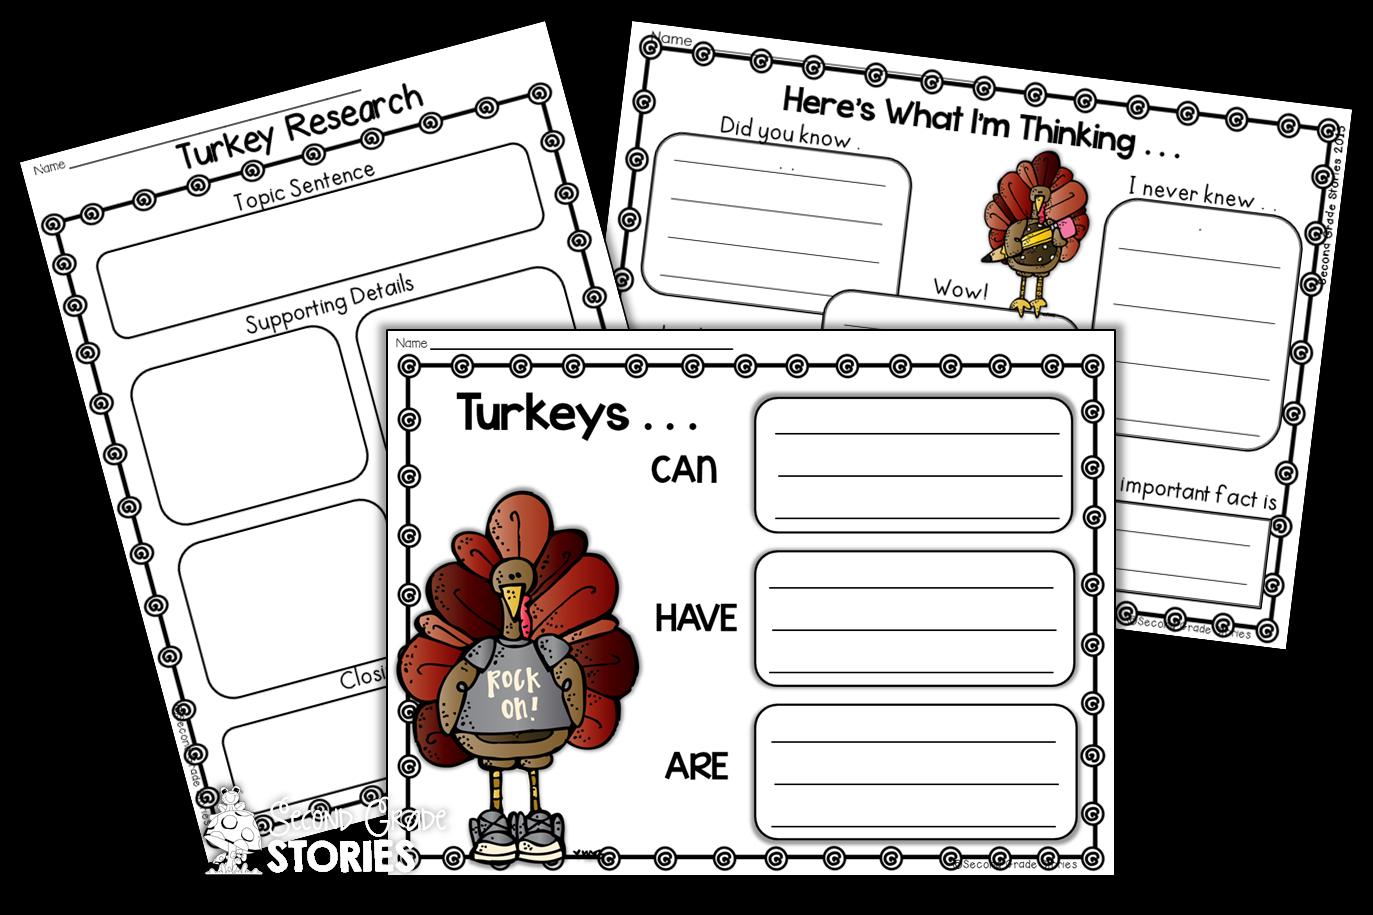 Non fiction book clipart clip art black and white stock Let's Talk Turkey - Nonfiction Turkey Fun! - Second Grade Stories clip art black and white stock